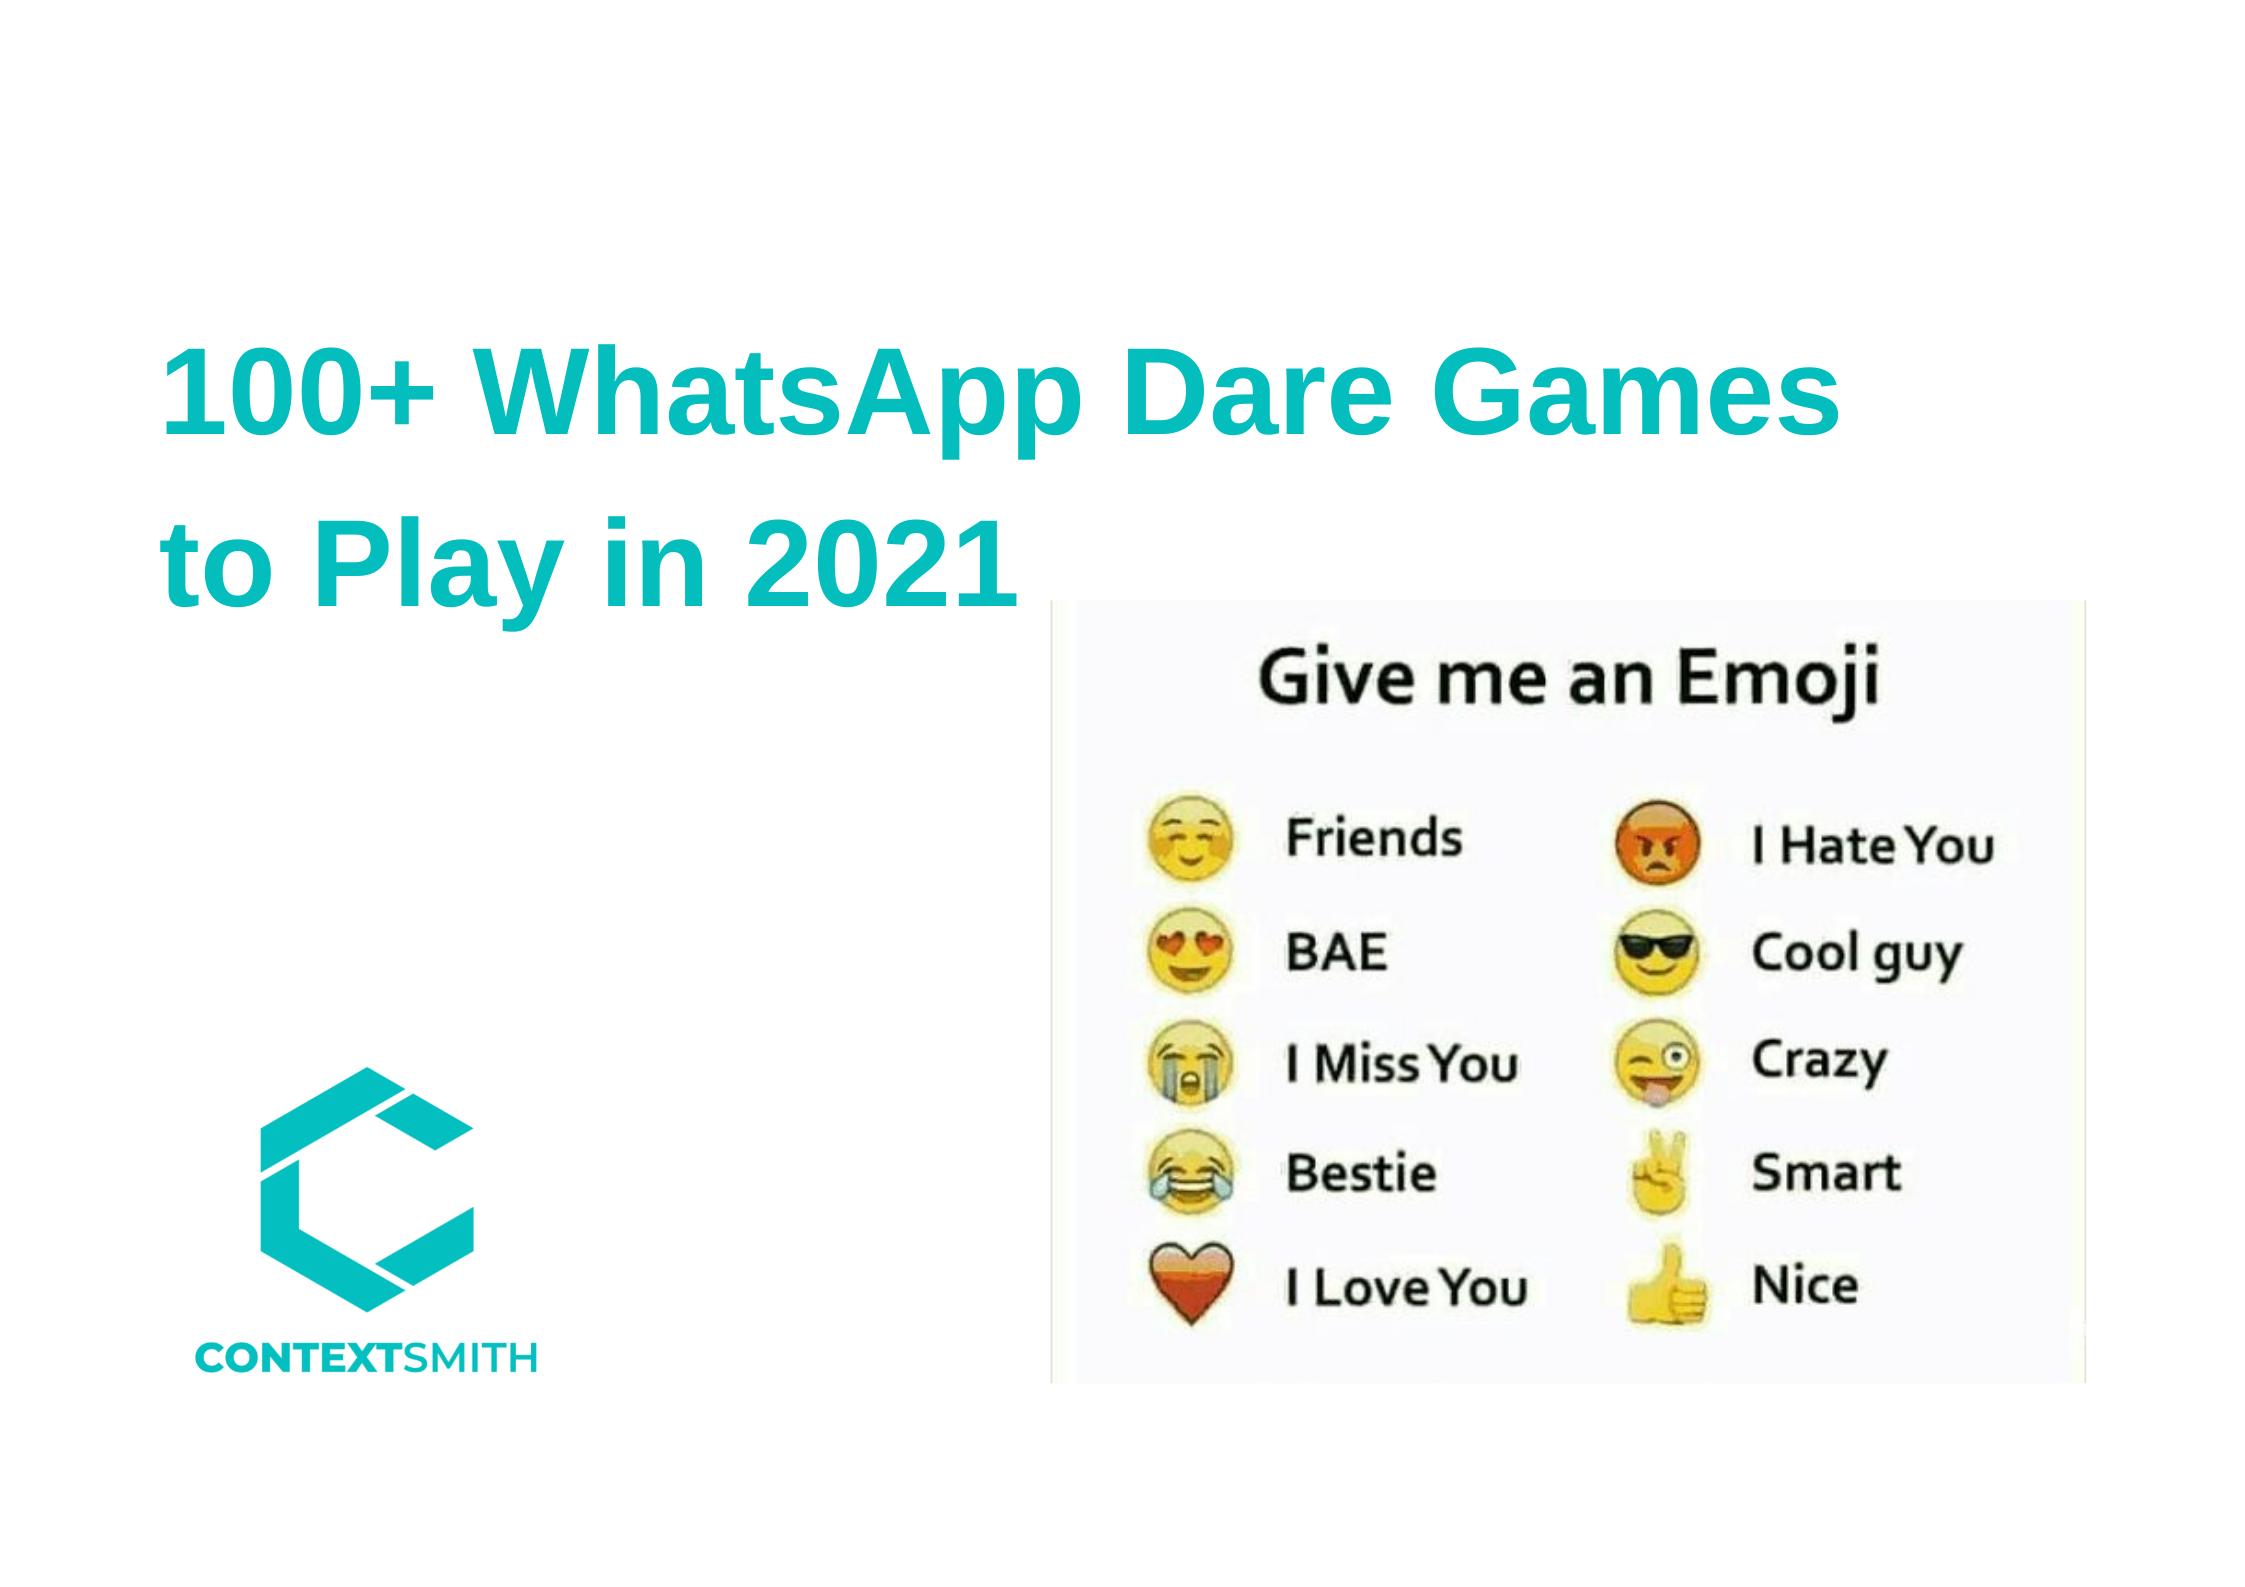 Whatsapp Dare Games